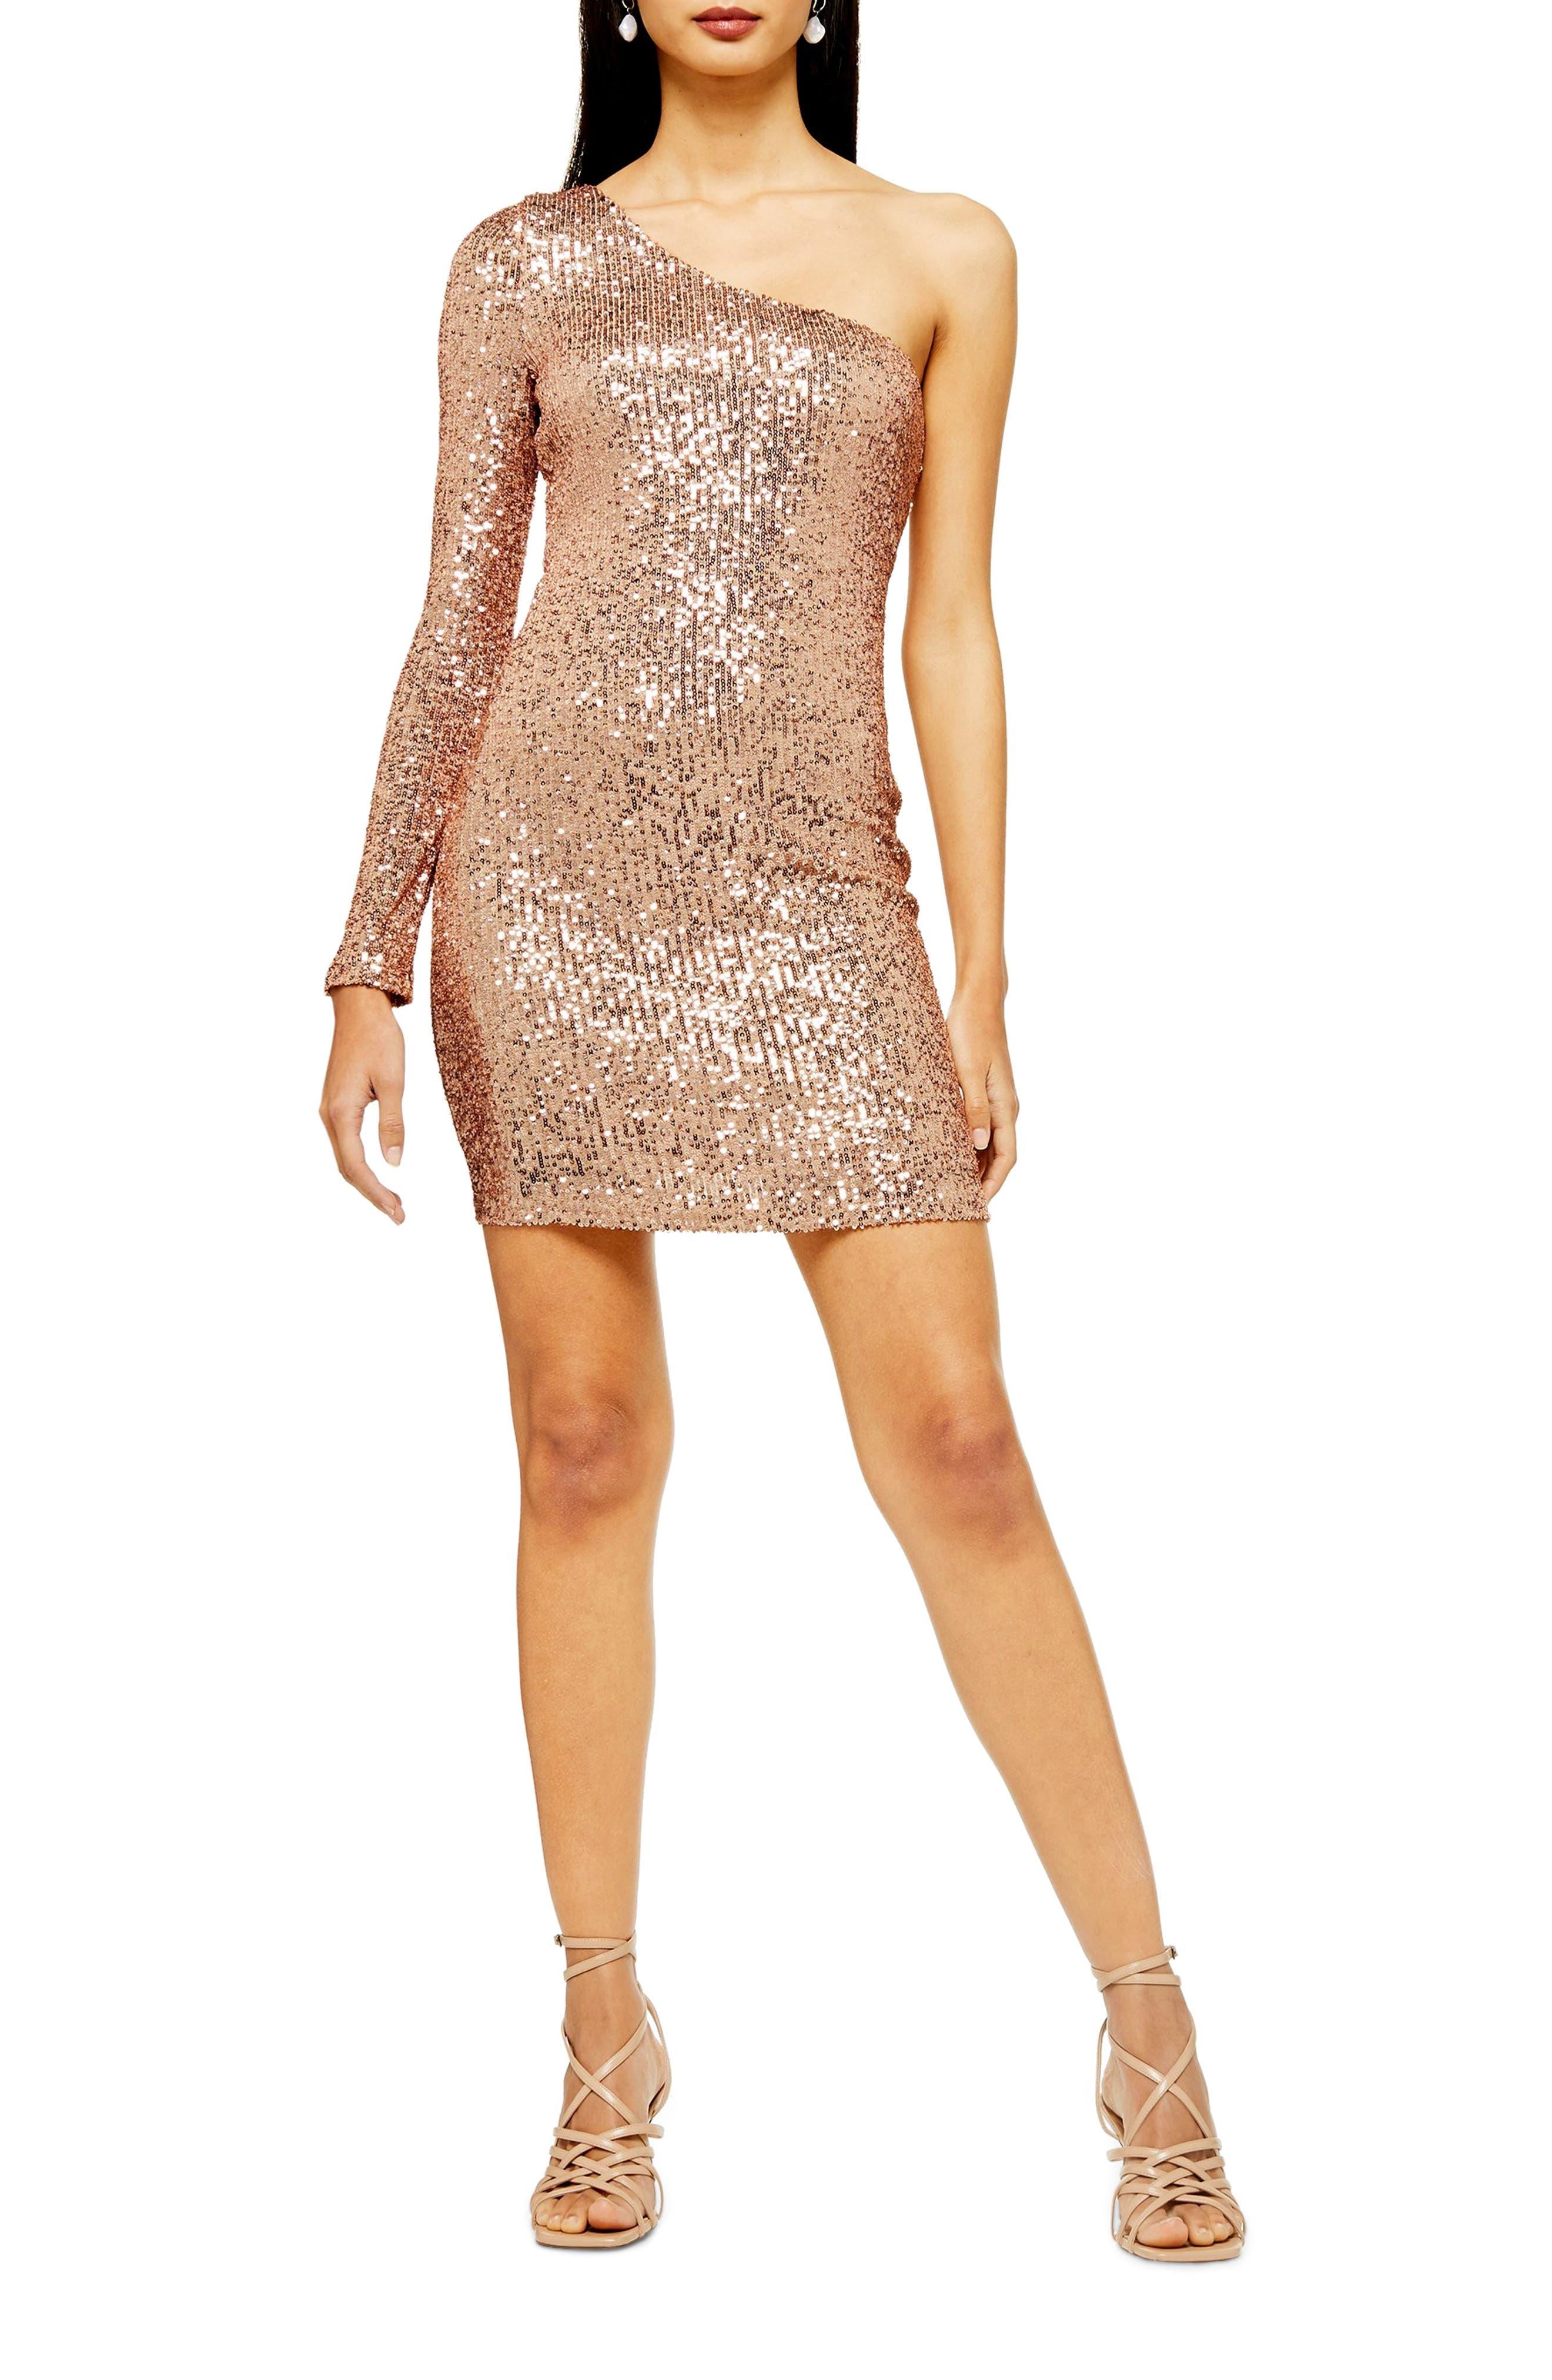 Topshop Sequin One-Sleeve Minidress, US (fits like 0-2) - Metallic